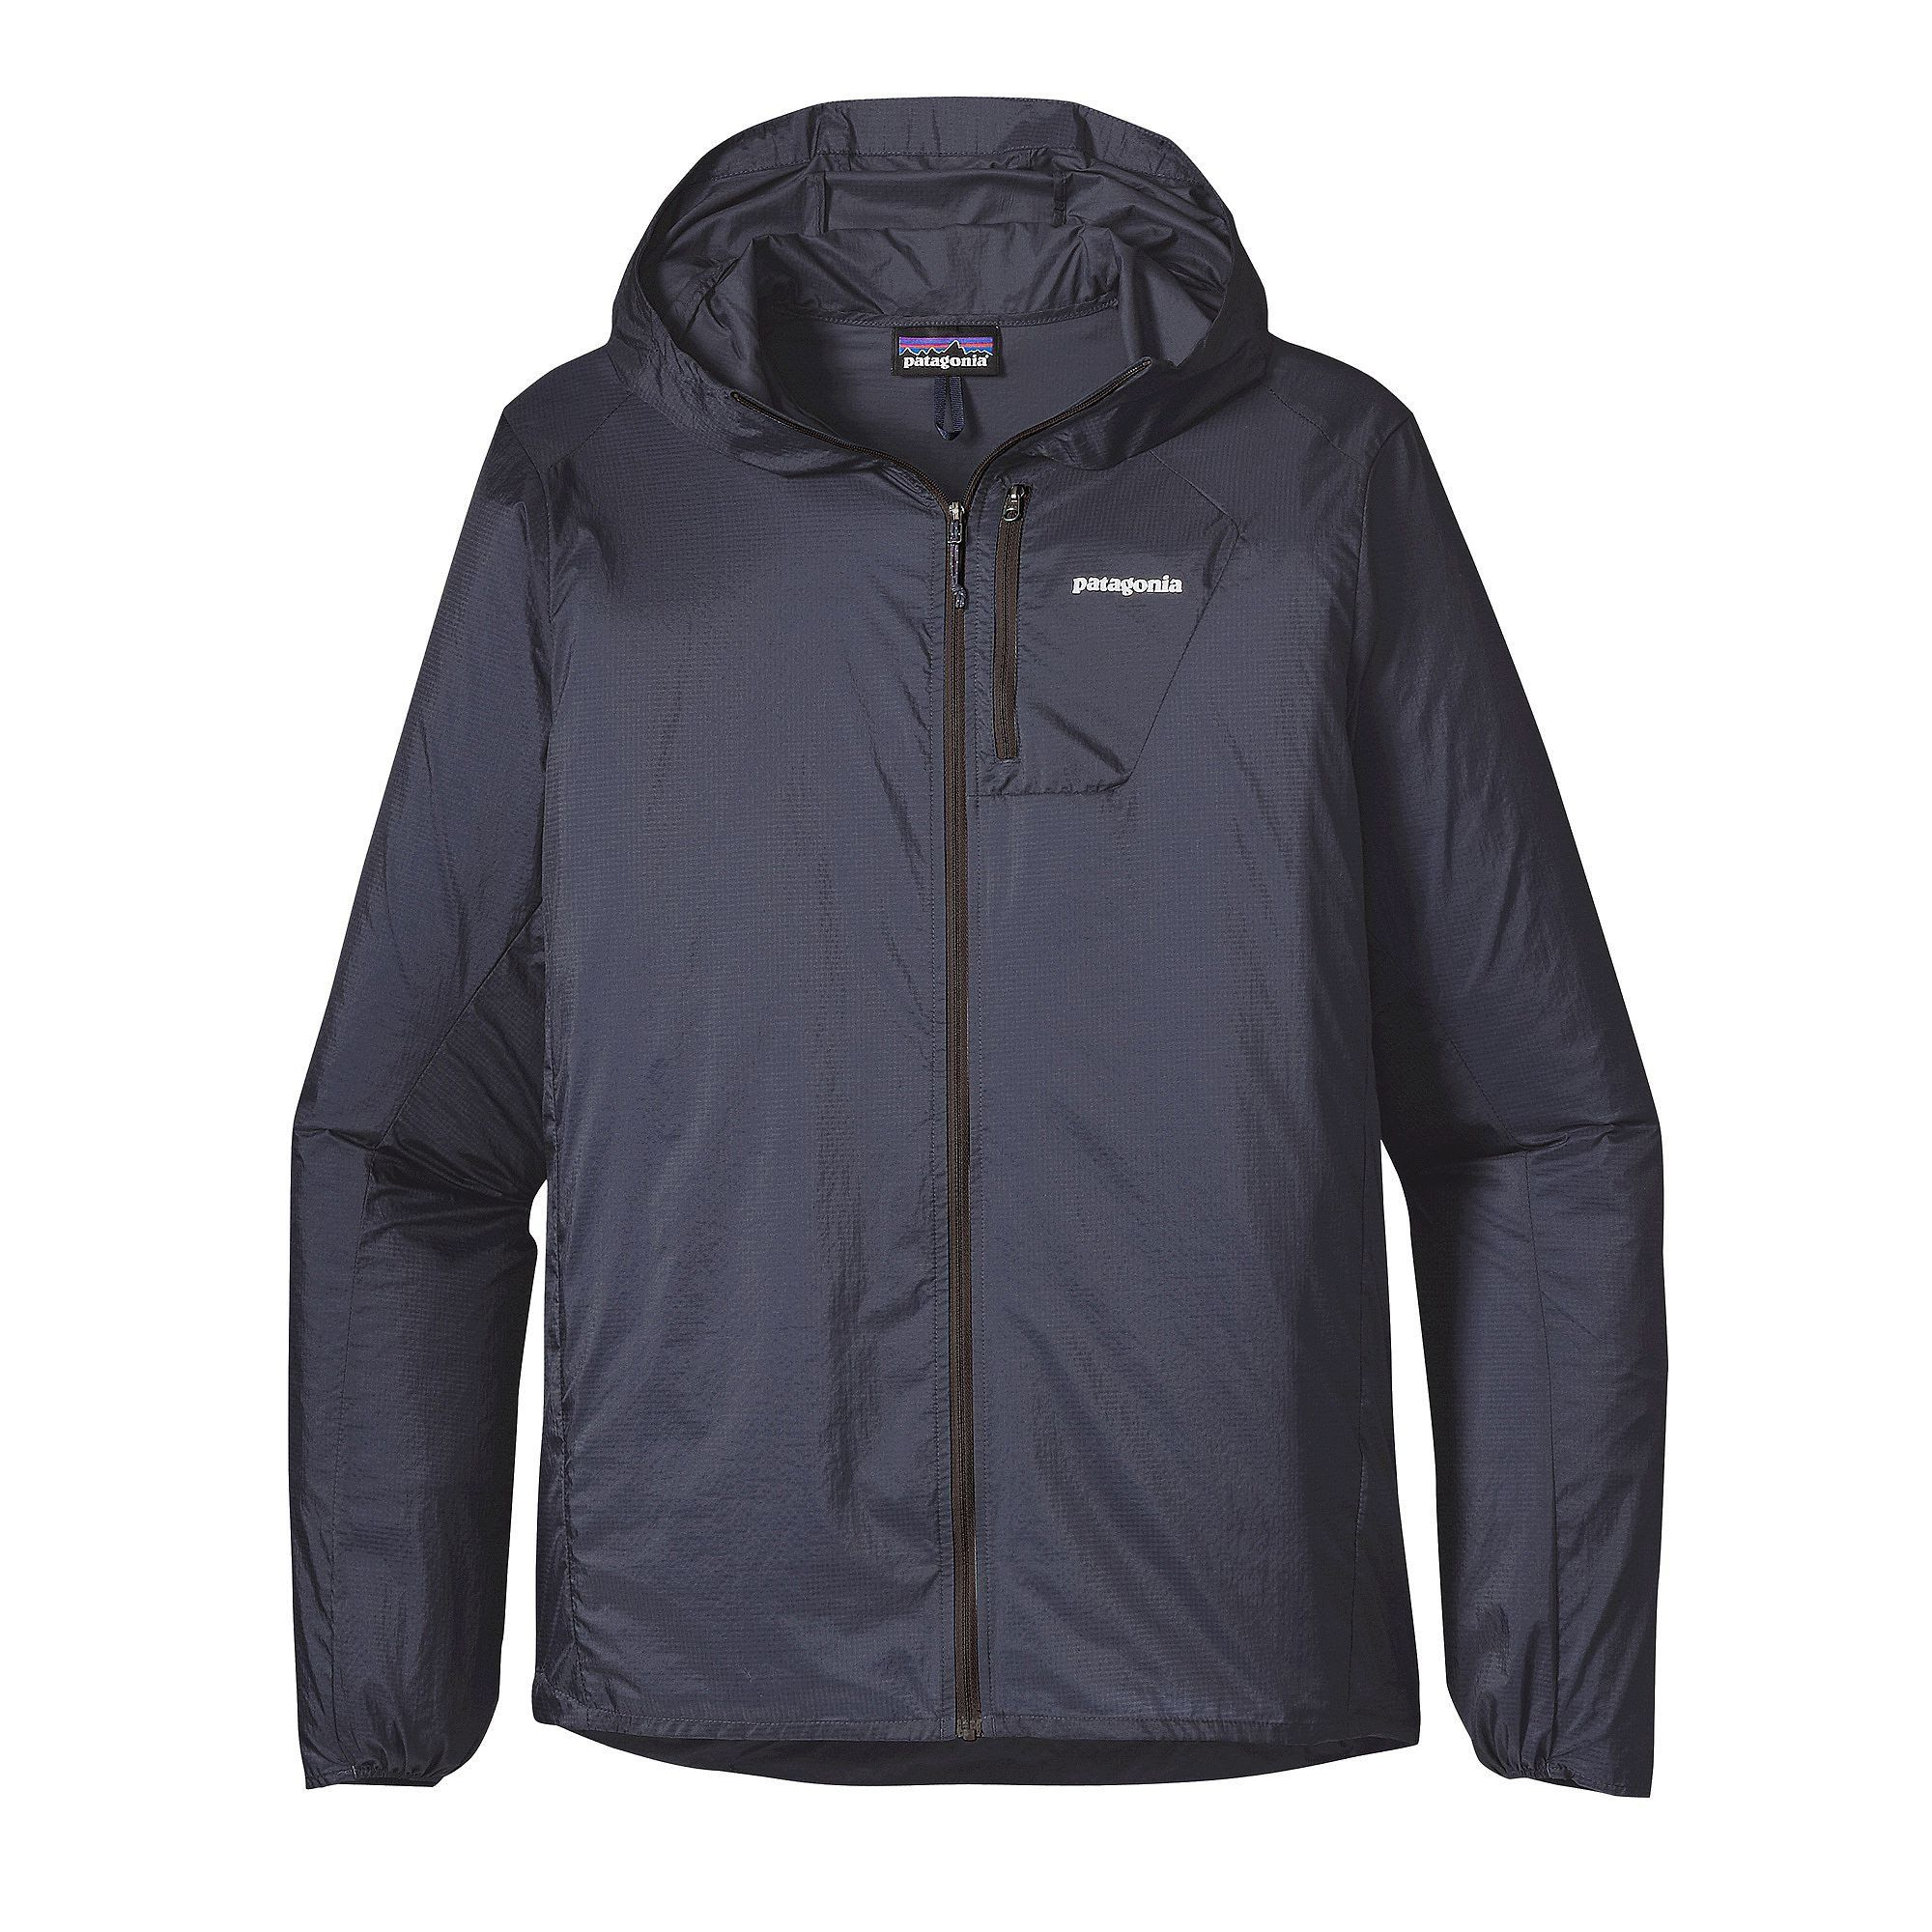 Patagonia men's houdini jacket